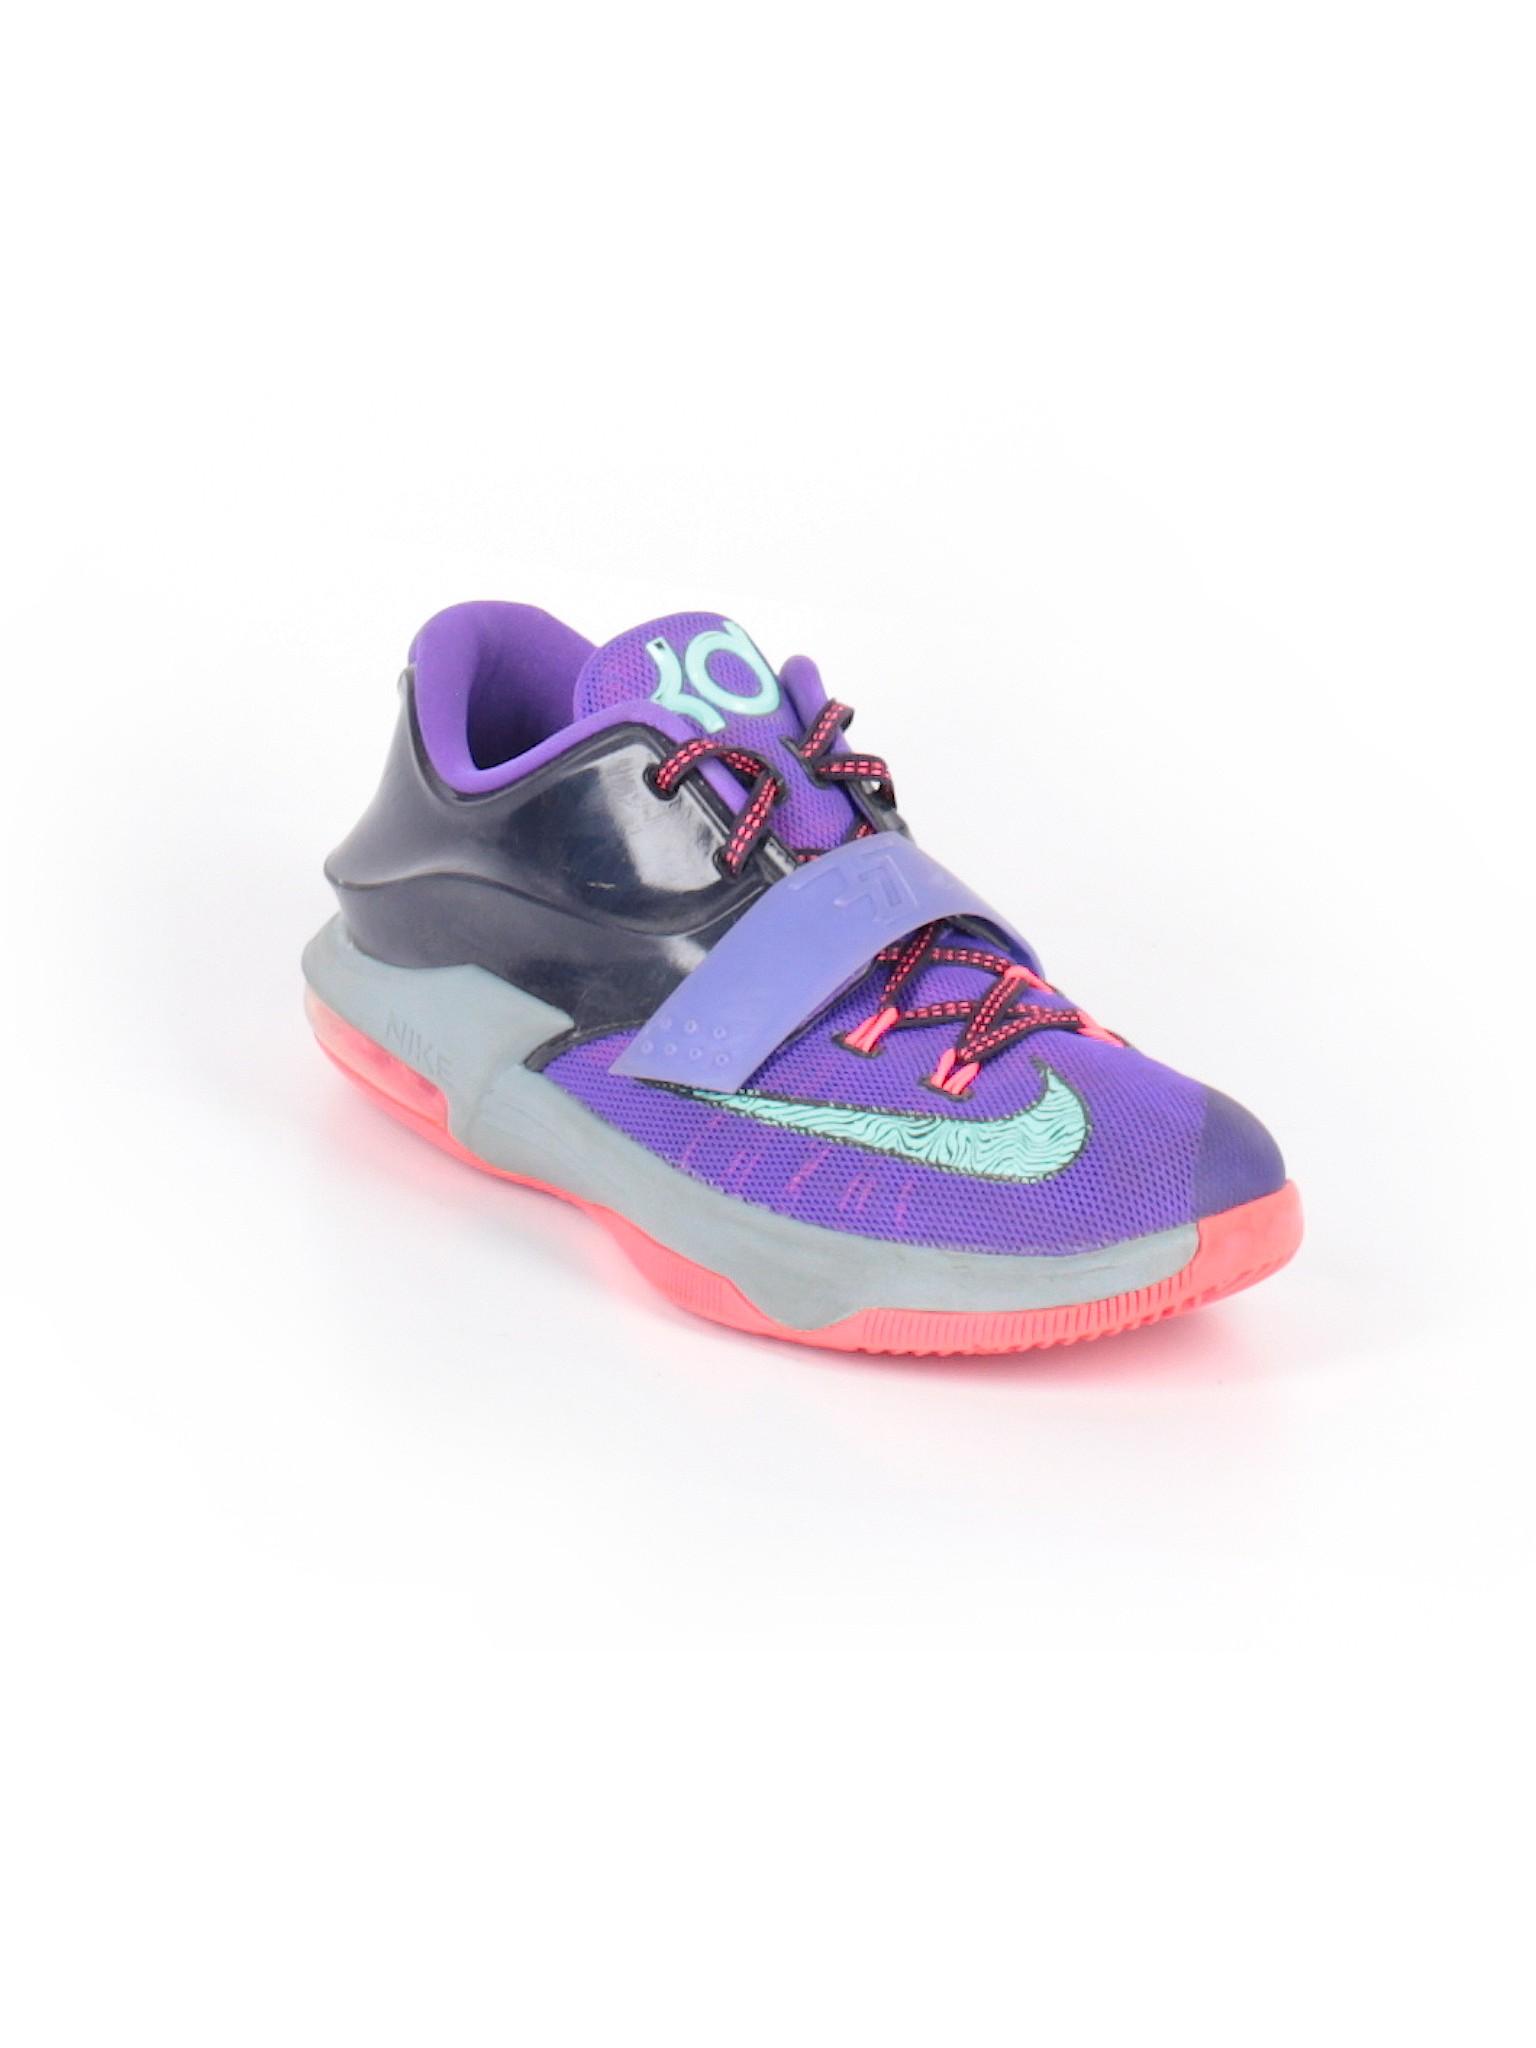 Nike Sneakers Sneakers Boutique Nike promotion promotion Boutique 8qSEFwZq